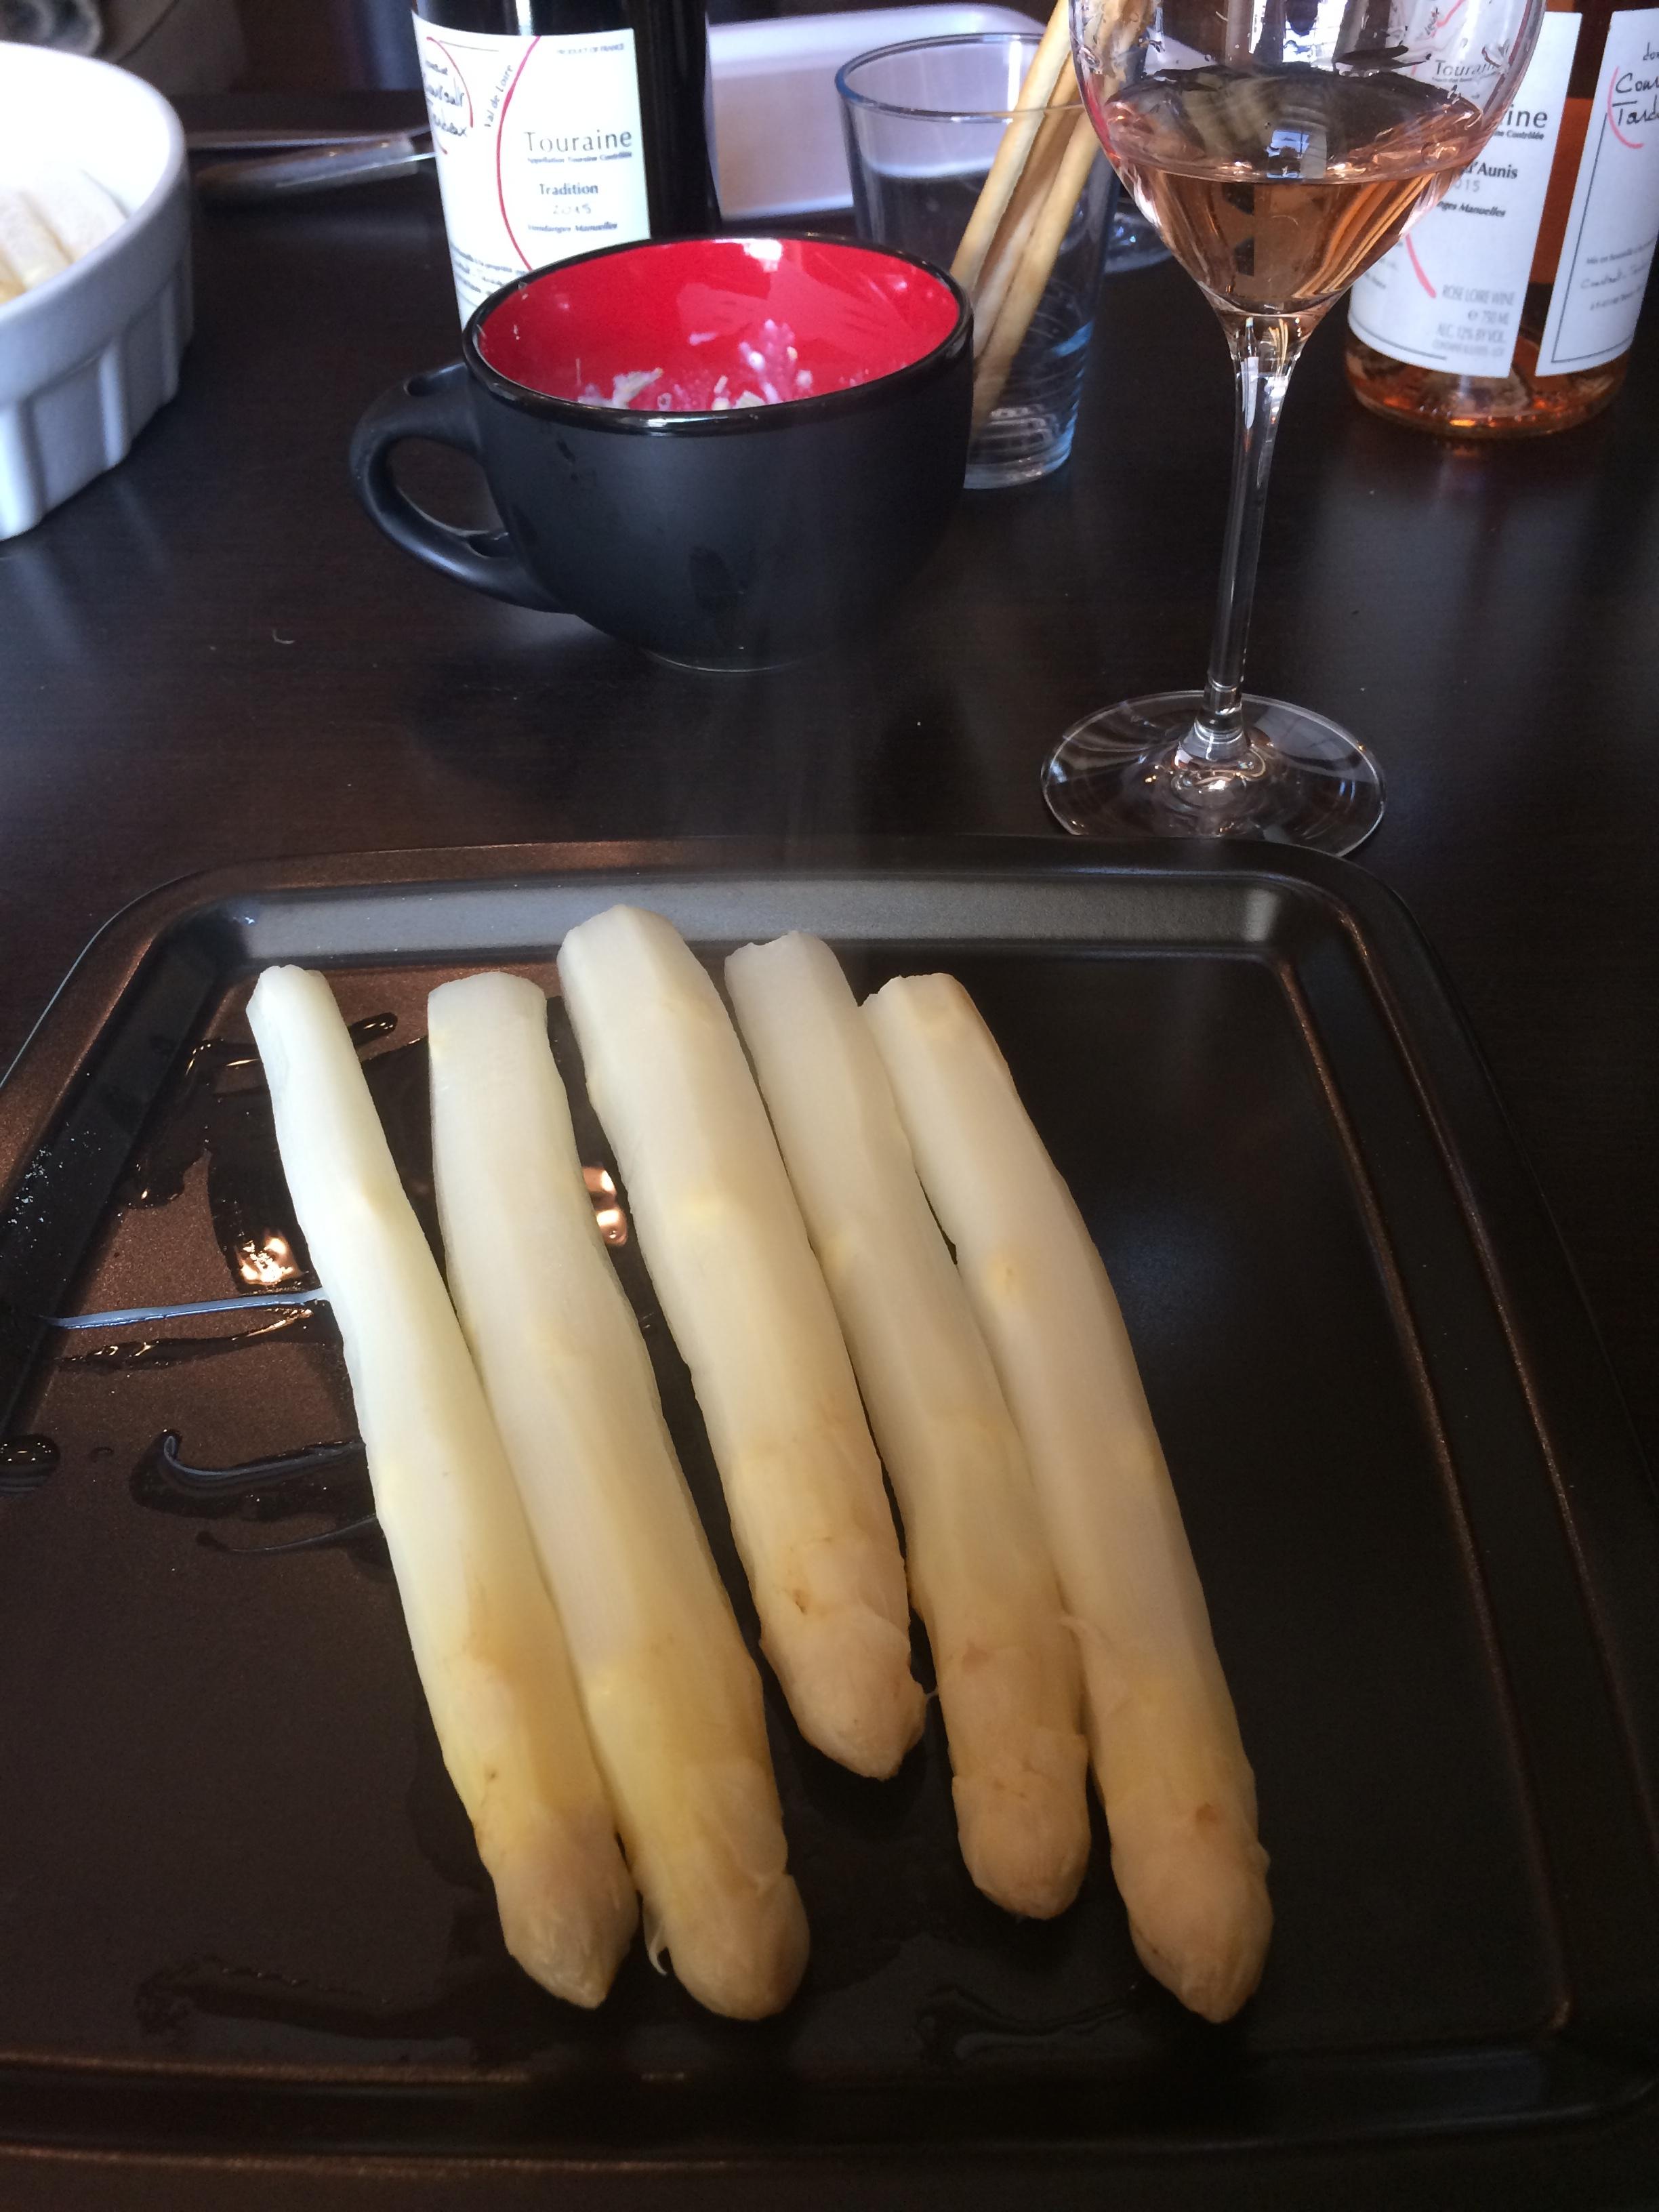 White Asparagus, Black Plate, Pineau Du0027Aunis Rosé.